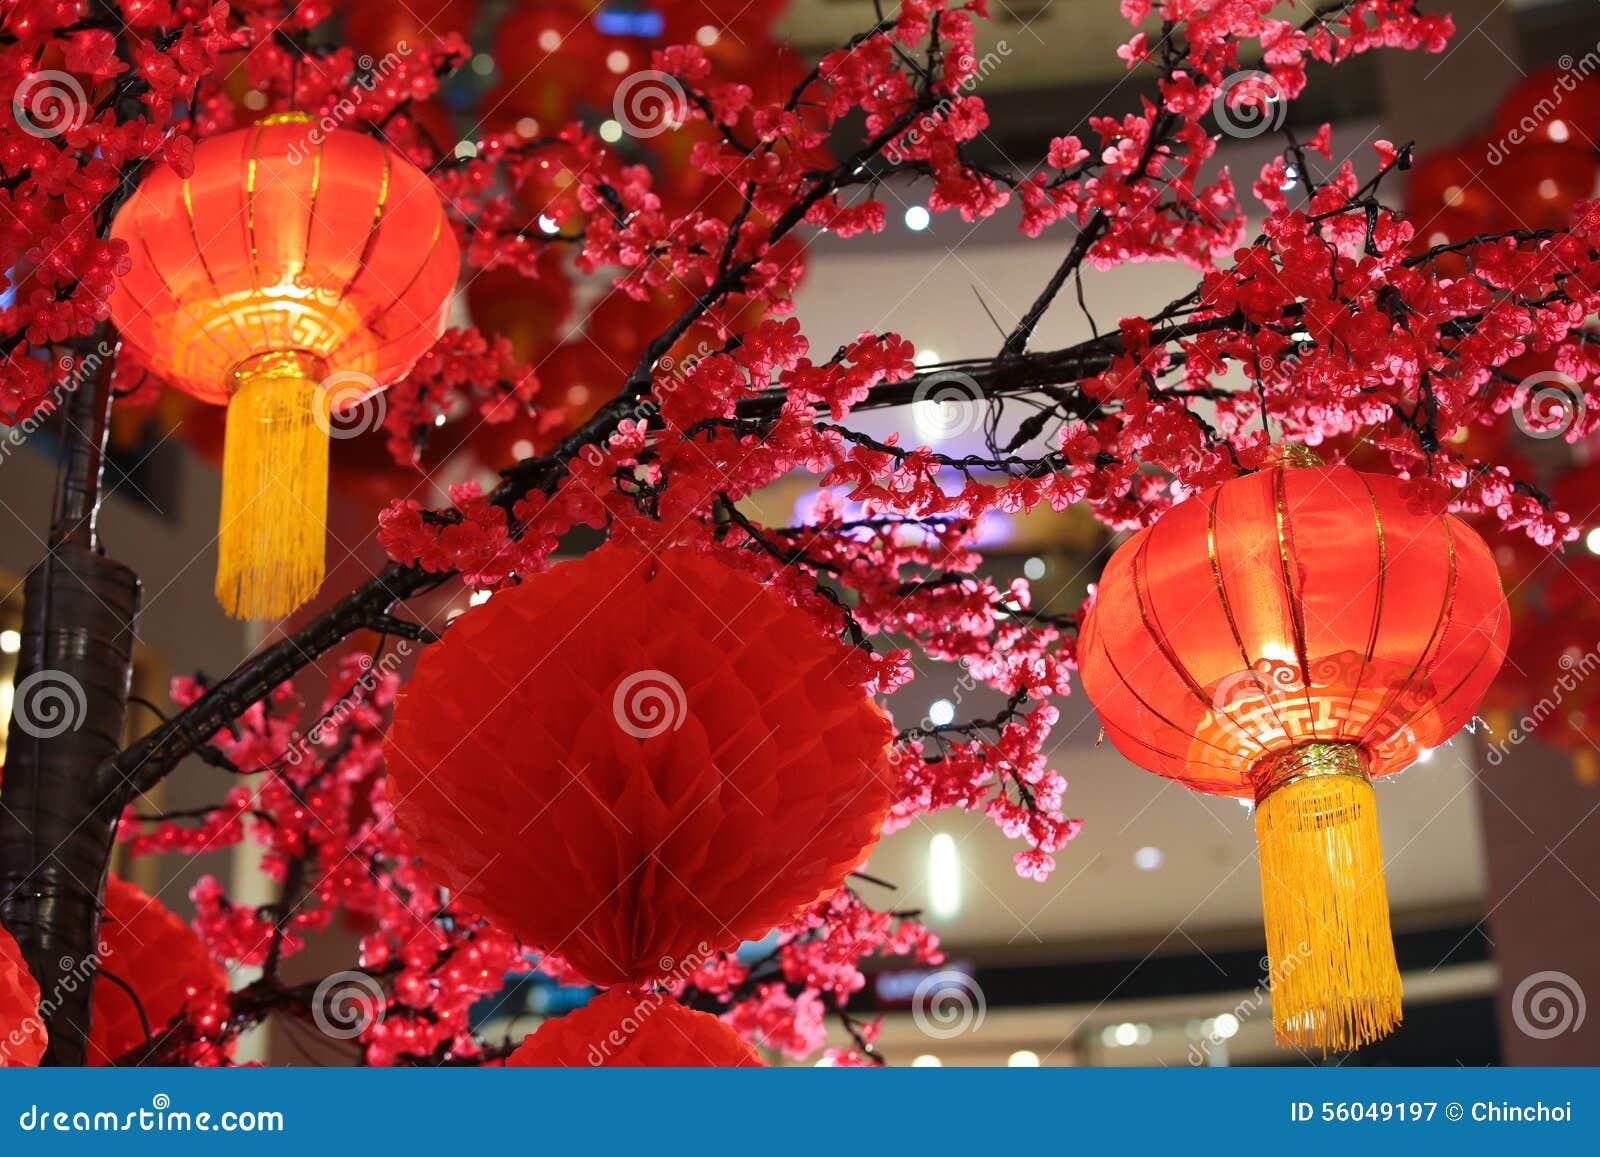 Chinese New Year Lantern Decorations Stock Photo - Image ...